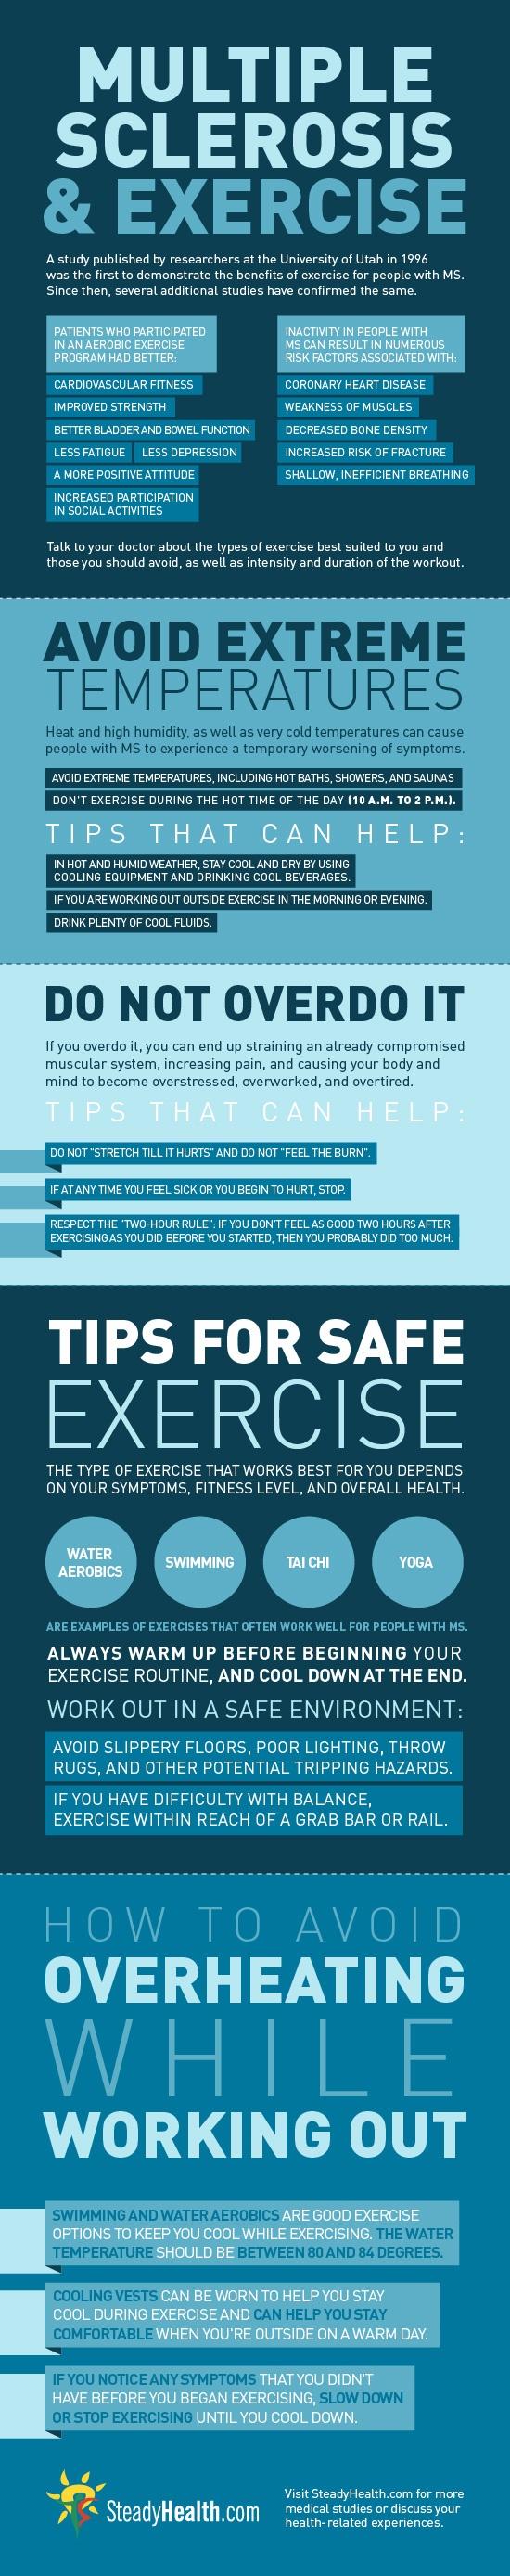 MSAND EXERCISE